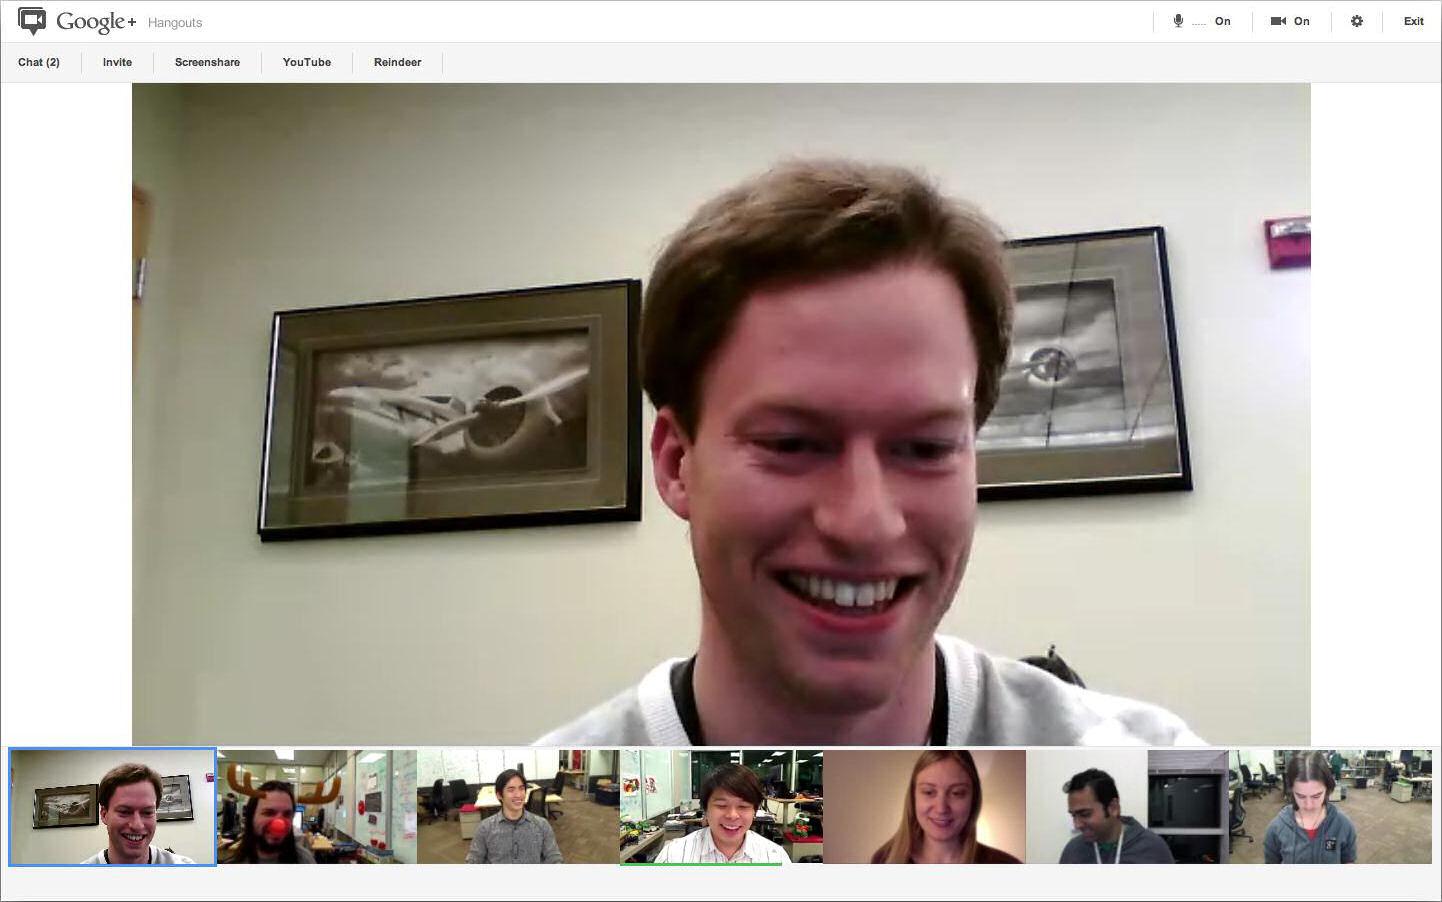 videollamadas grupo grupales google hangouts